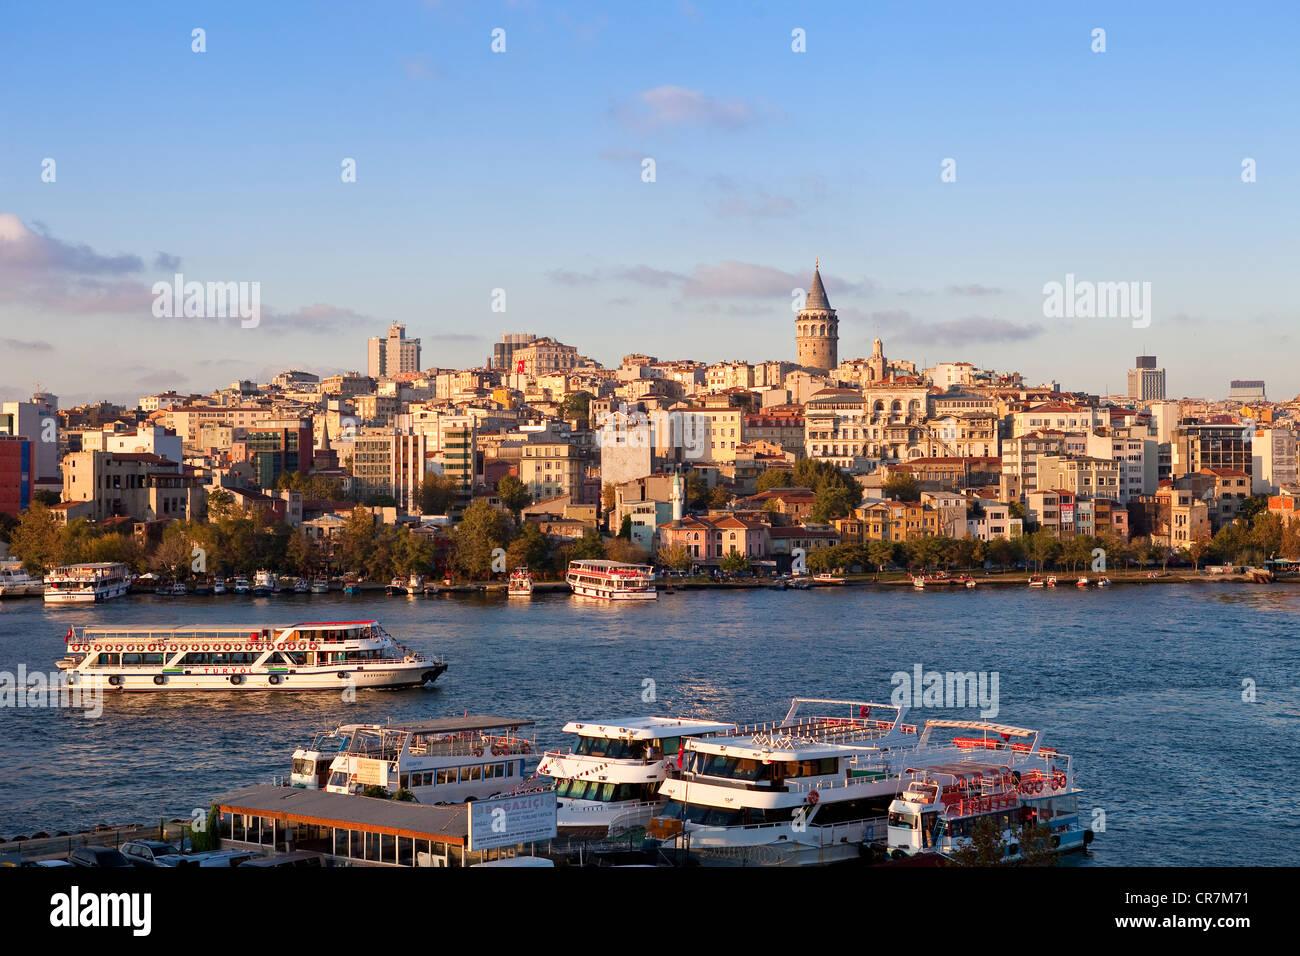 Turkey, Istanbul, Golden Horn Strait, ferry linking Beyoglu District, Galata Tower in the background Stock Photo